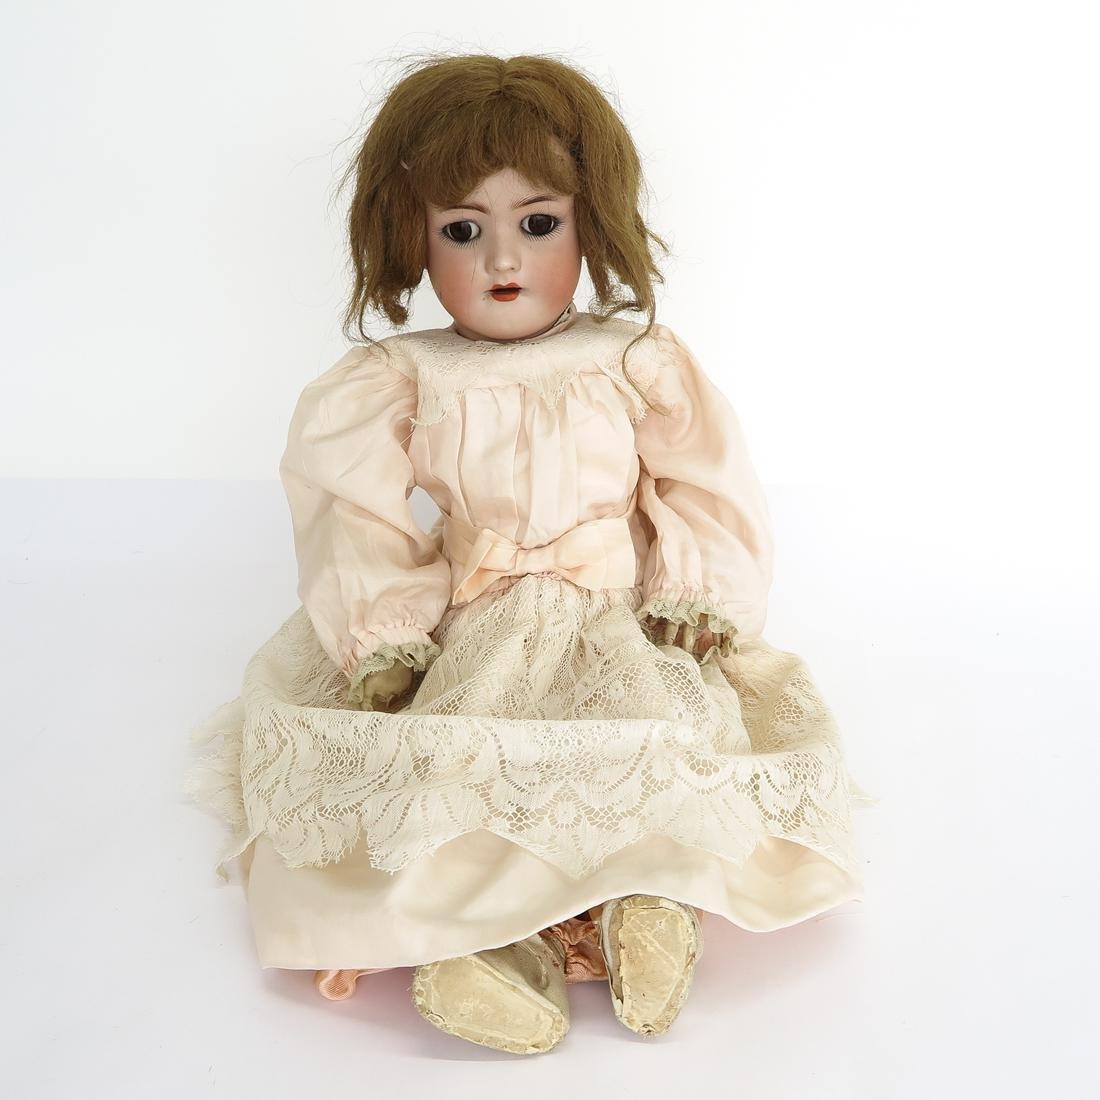 Heinrich Handwerck / Simon & Halbig Doll